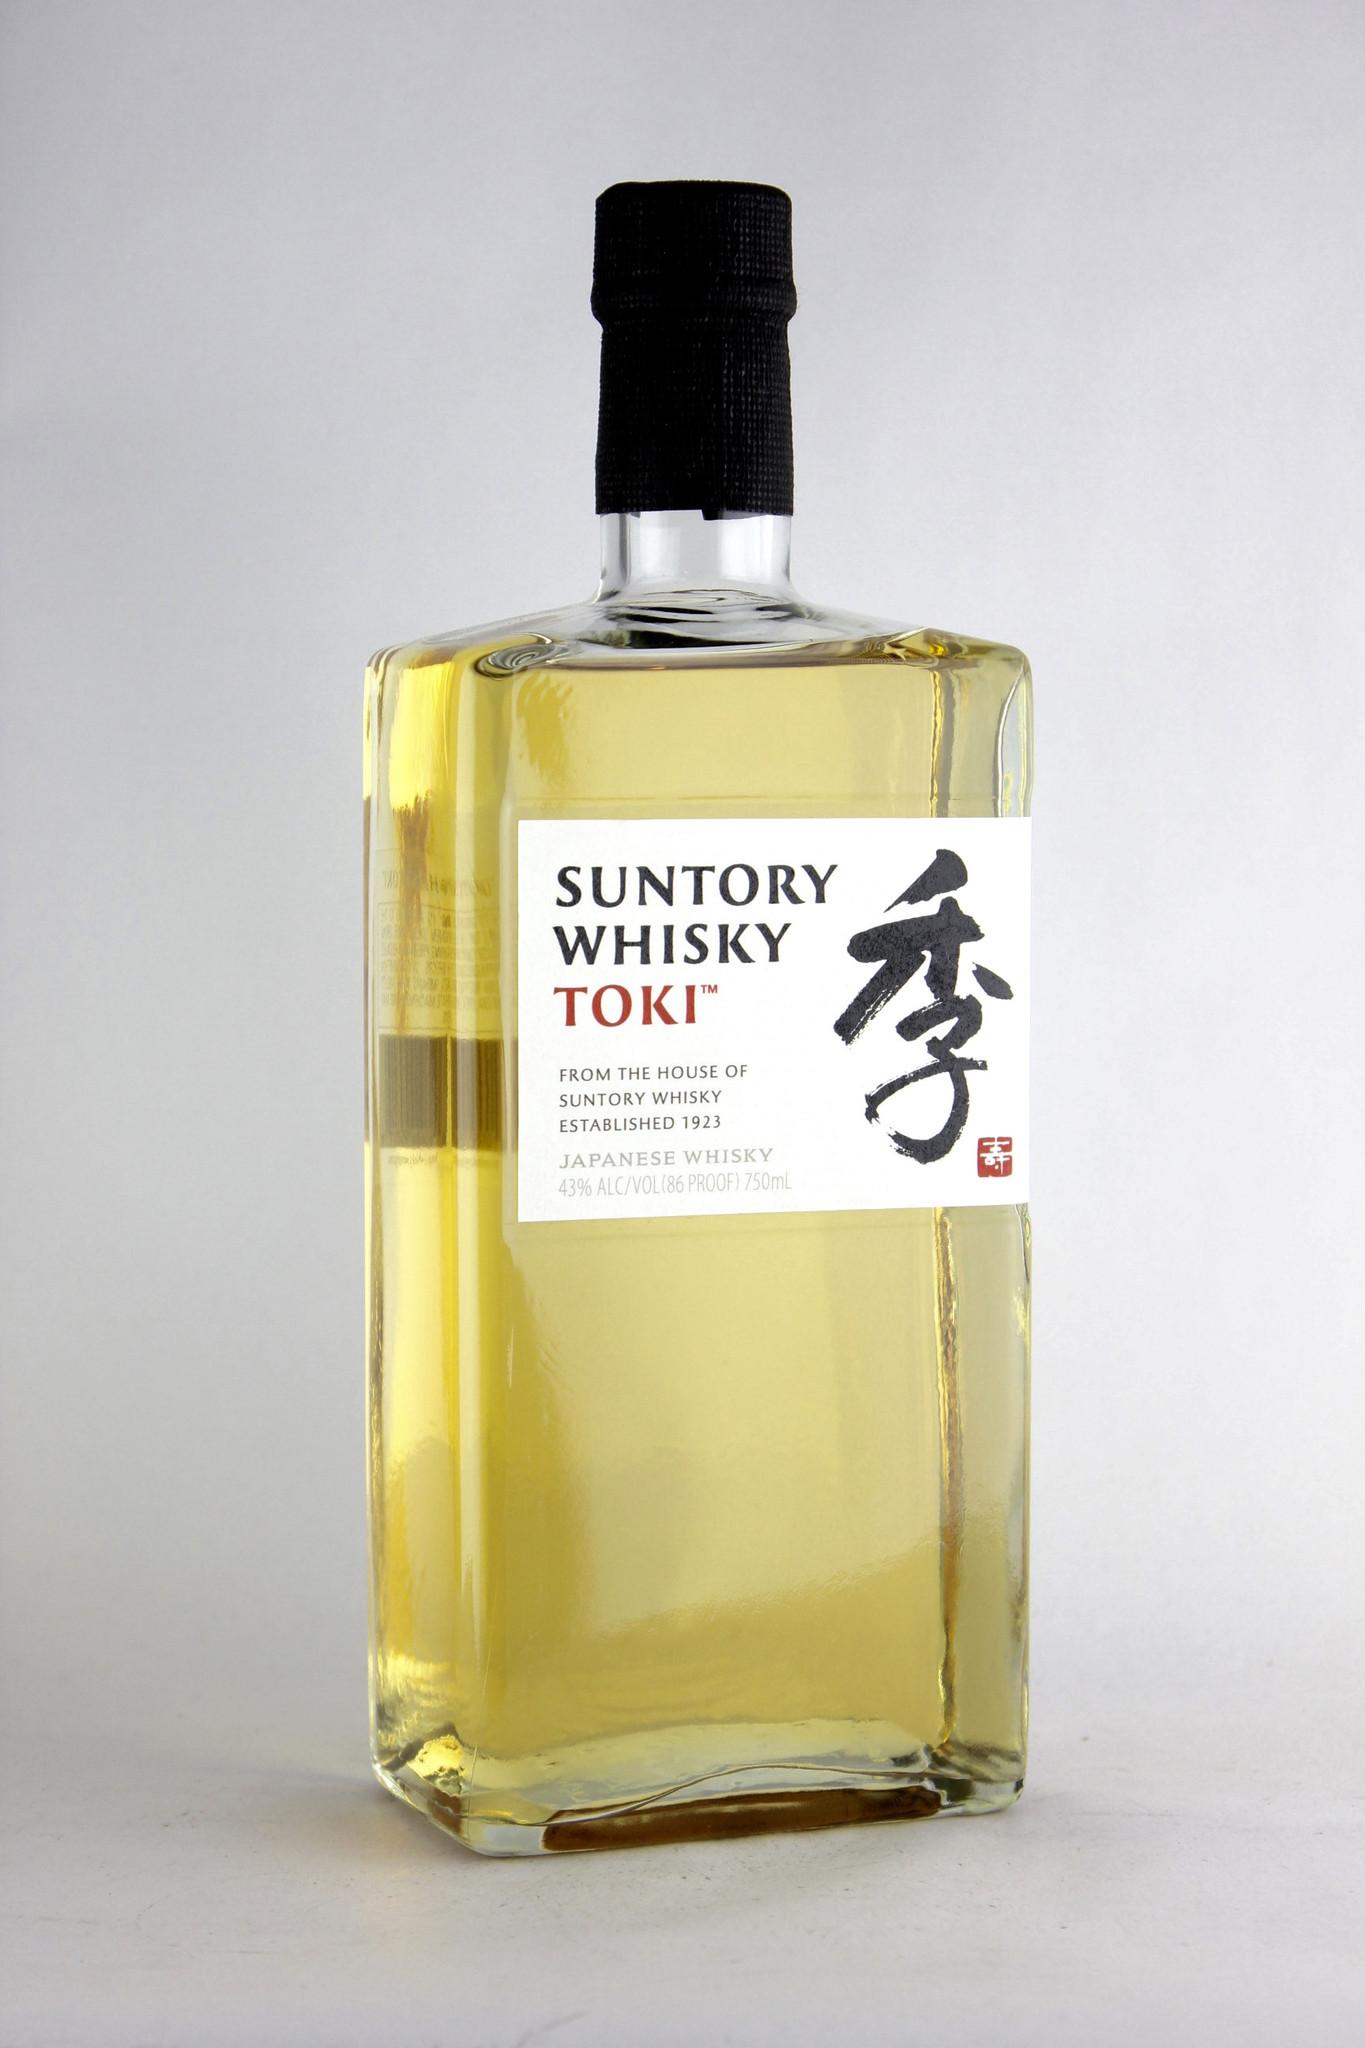 Suntory Whisky Toki Bottle